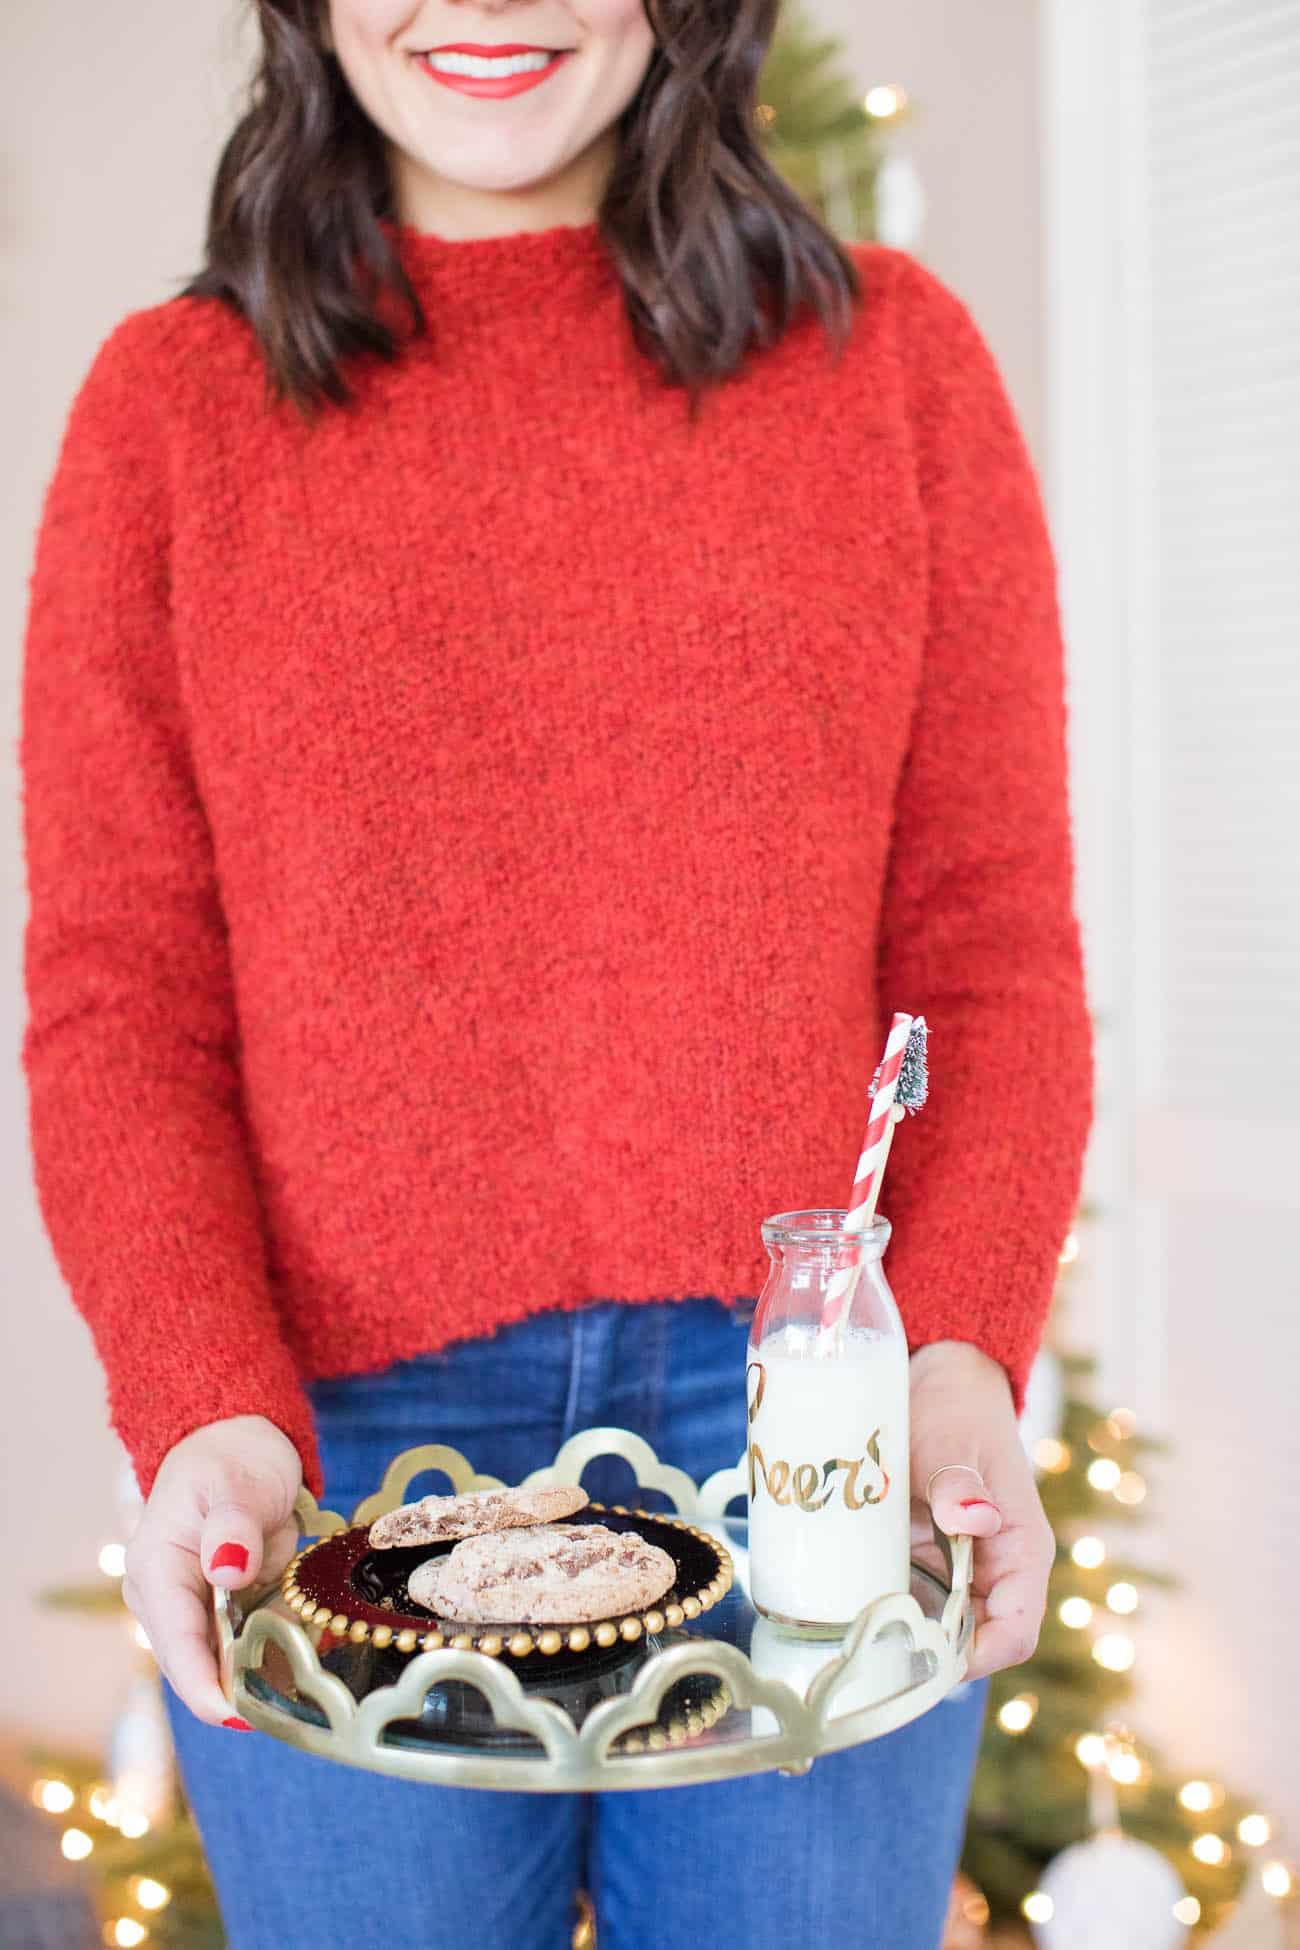 cookies for santa, christmas decorating ideas - My Style Vita @mystylevita